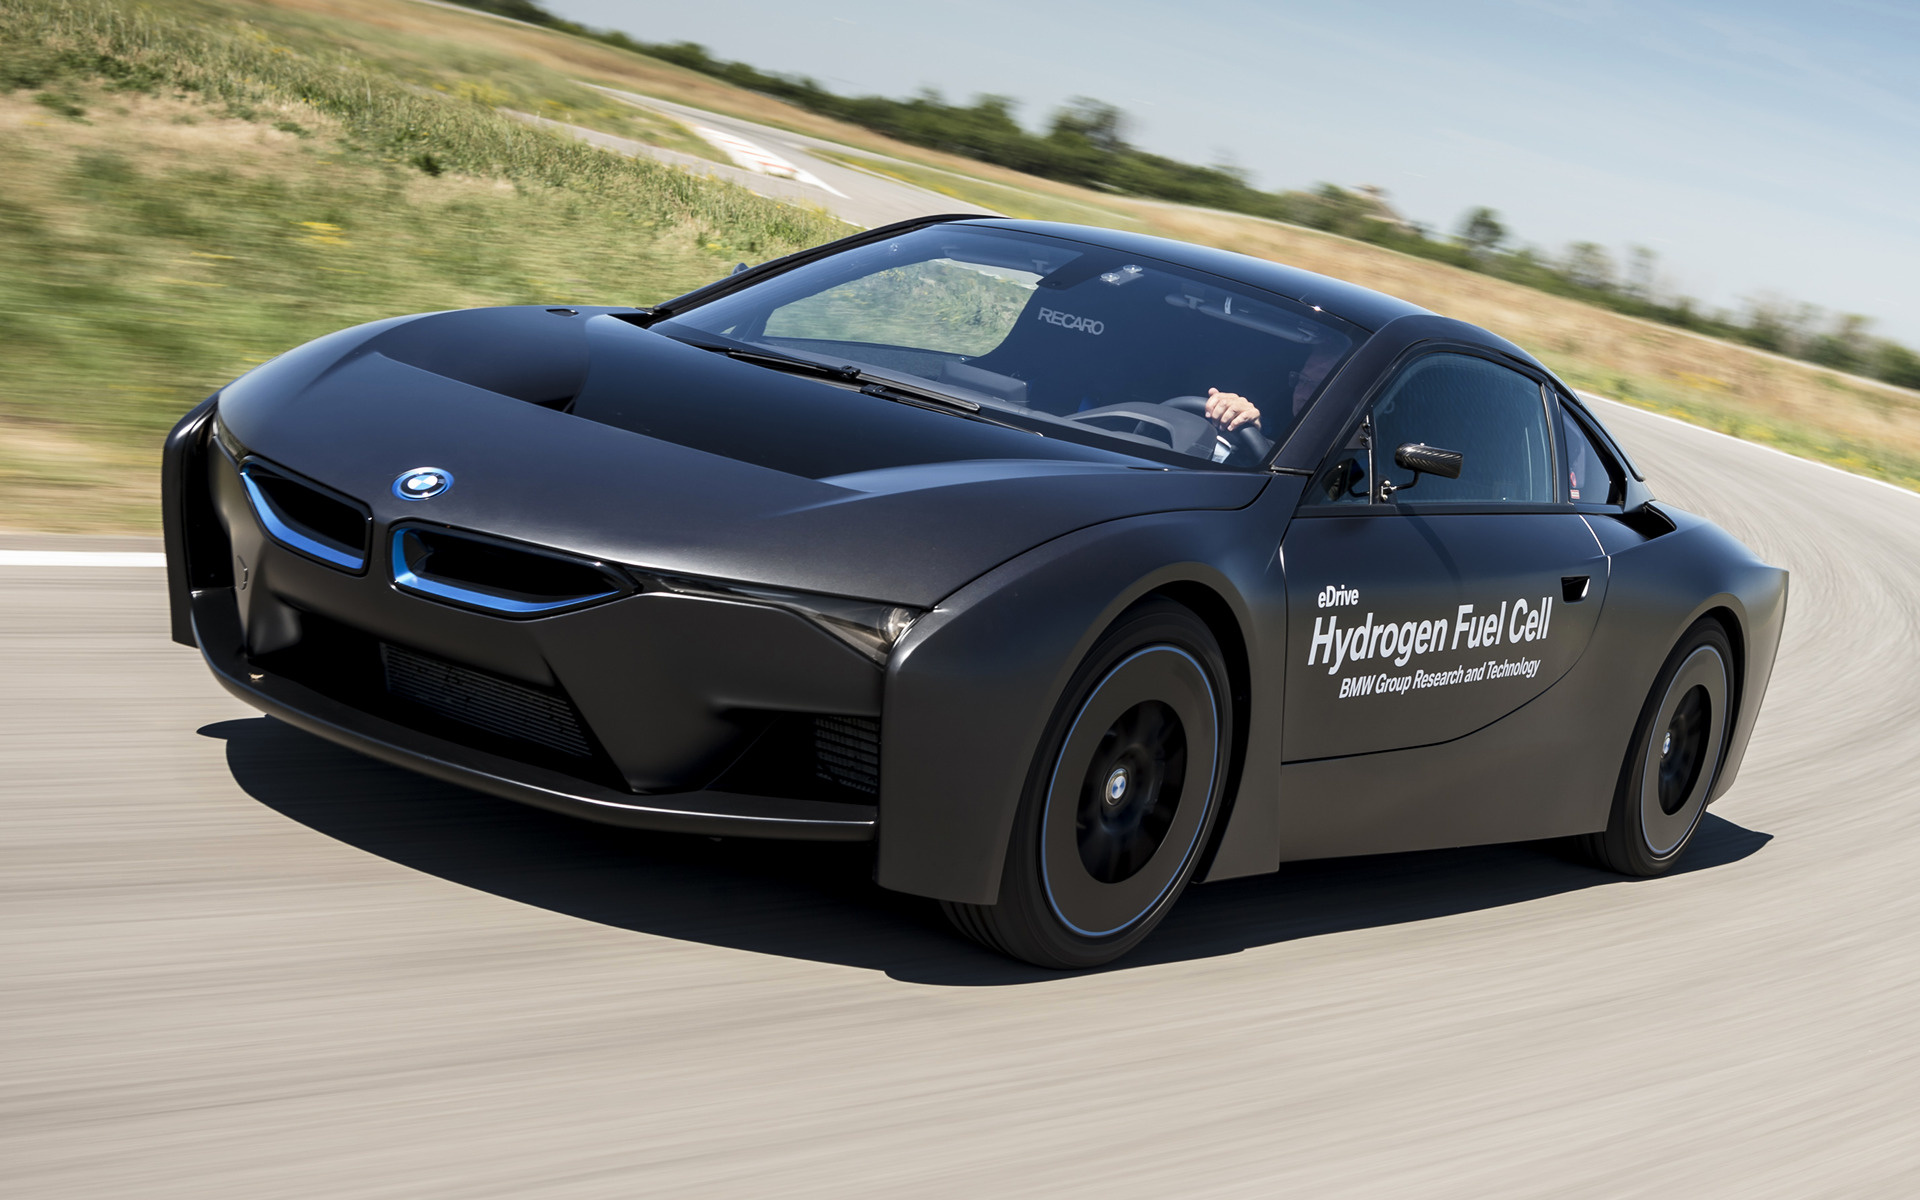 2015 Bmw I8 Hydrogen Fuel Cell Edrive Prototype